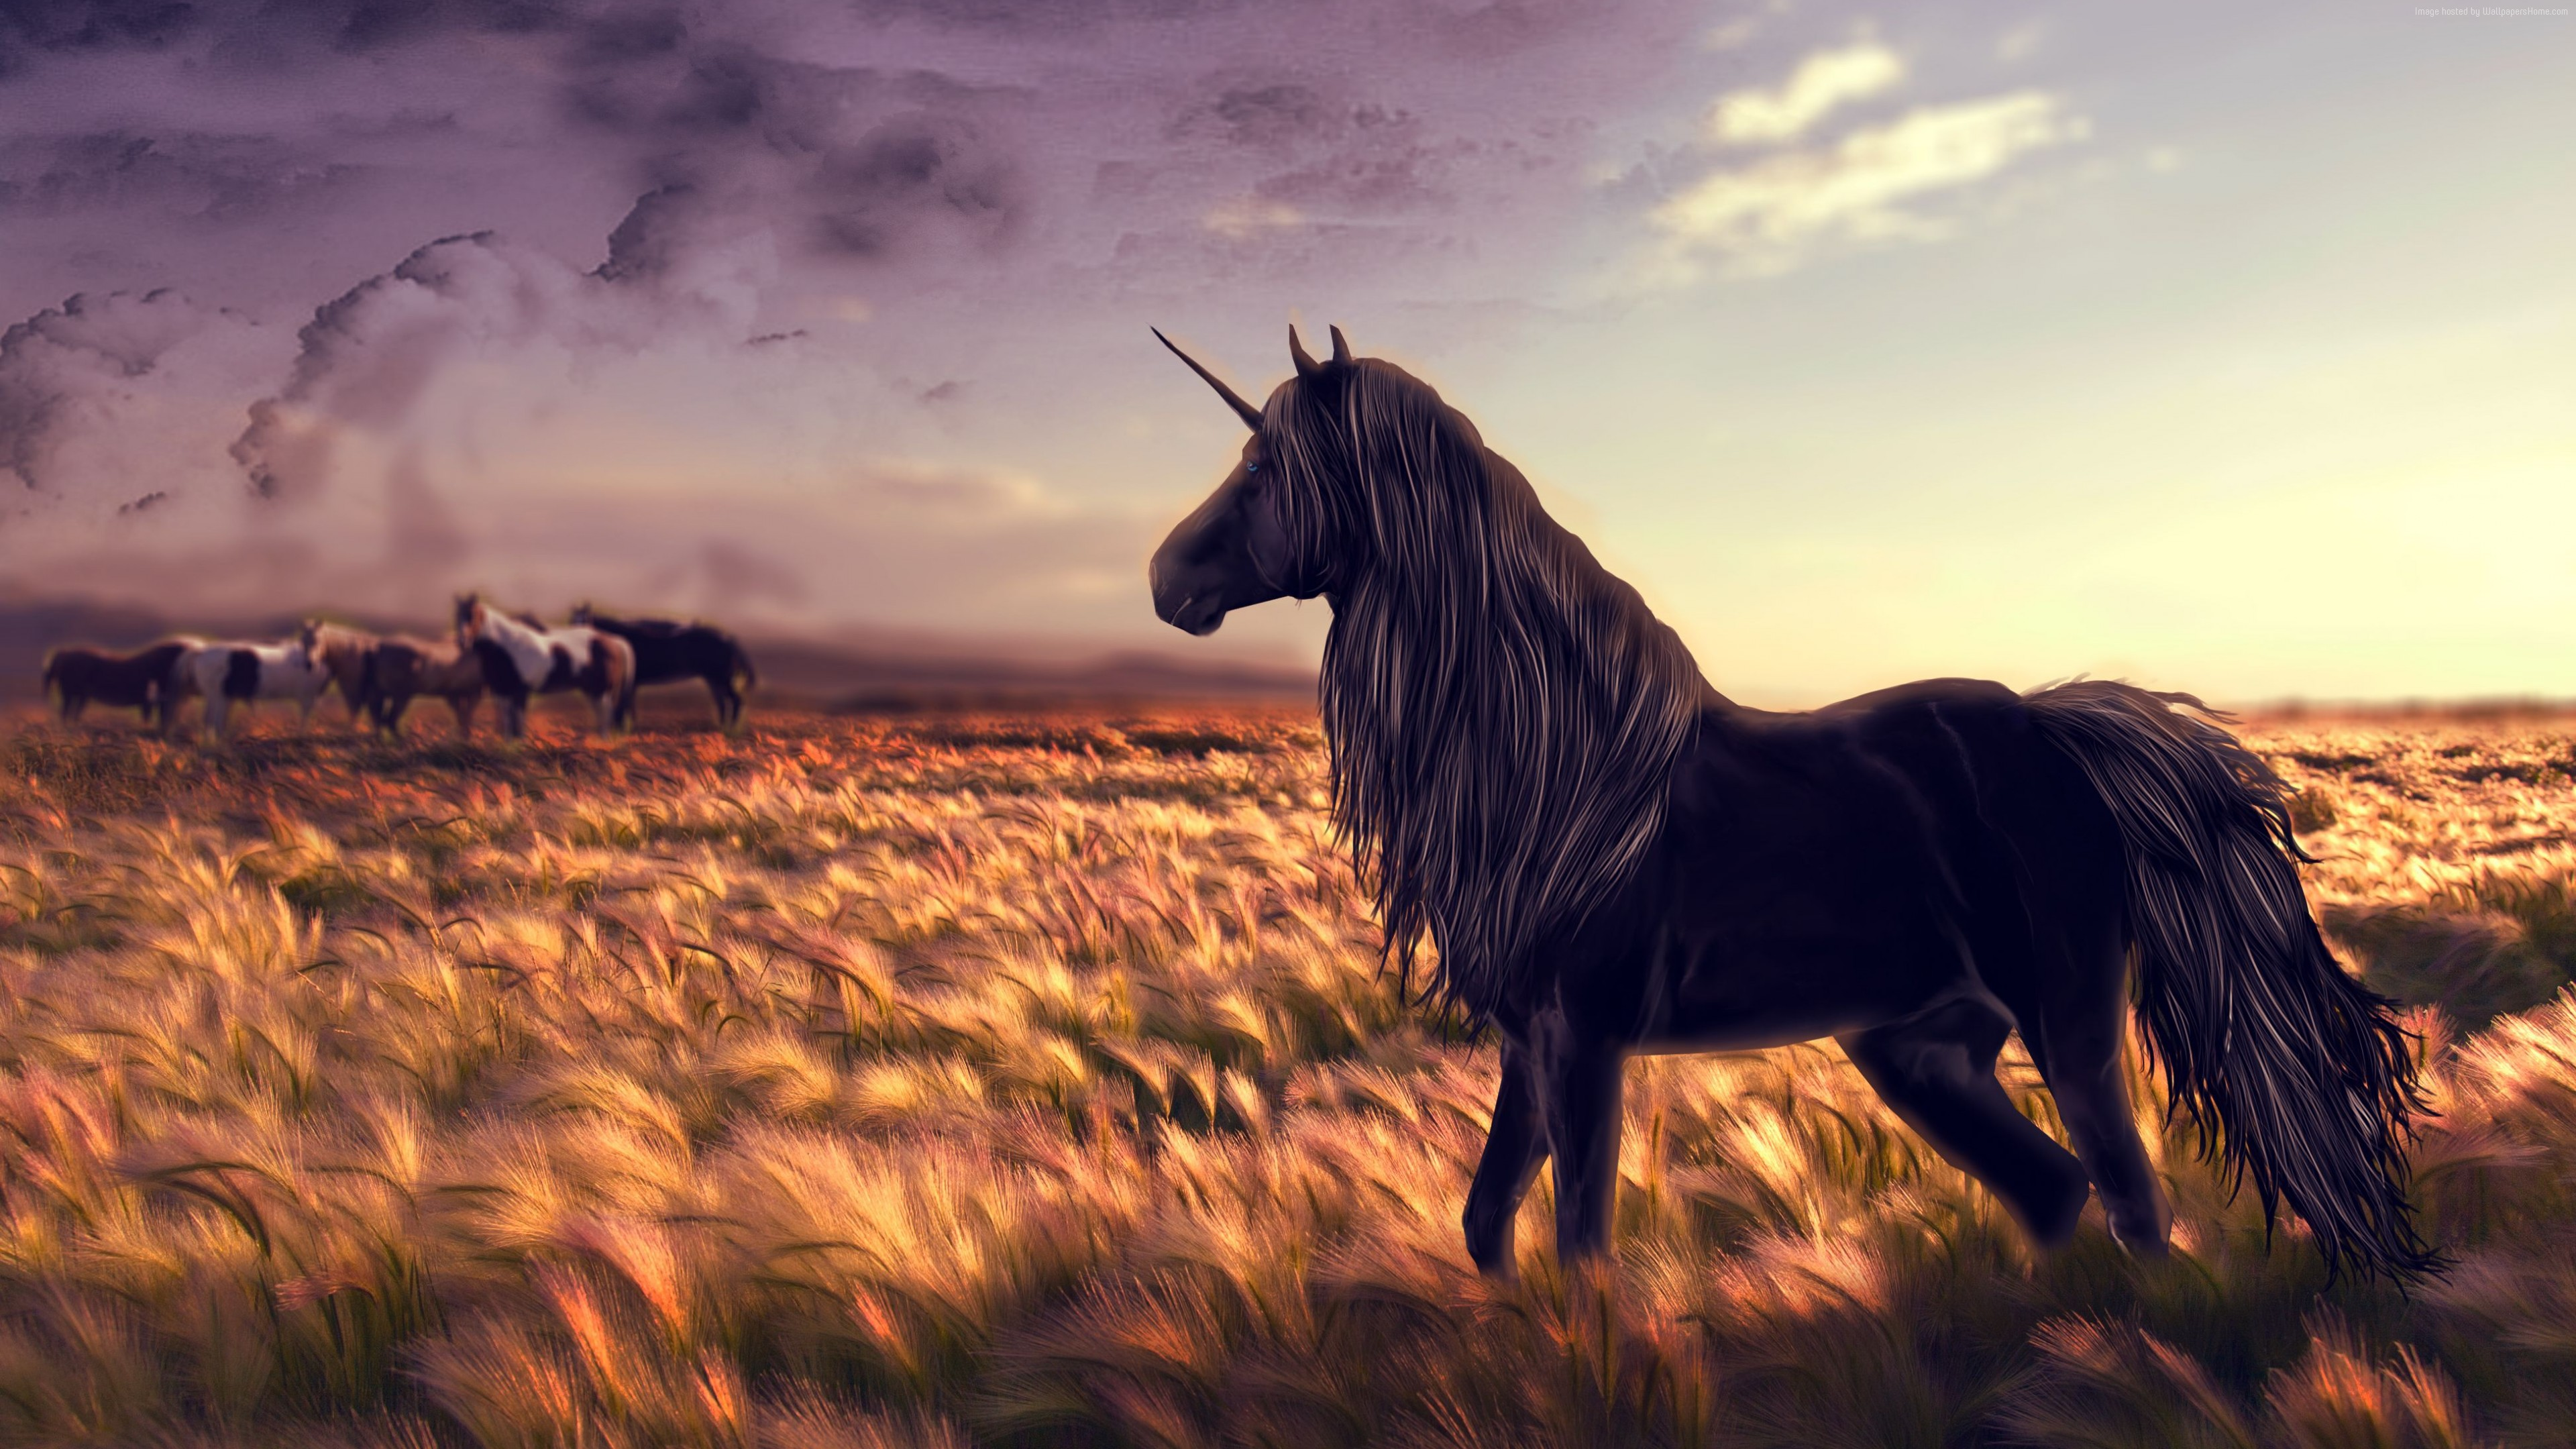 unicorn in field 4k 1540750014 - Unicorn In Field 4k - unicorn wallpapers, hd-wallpapers, digital art wallpapers, artwork wallpapers, artist wallpapers, 4k-wallpapers